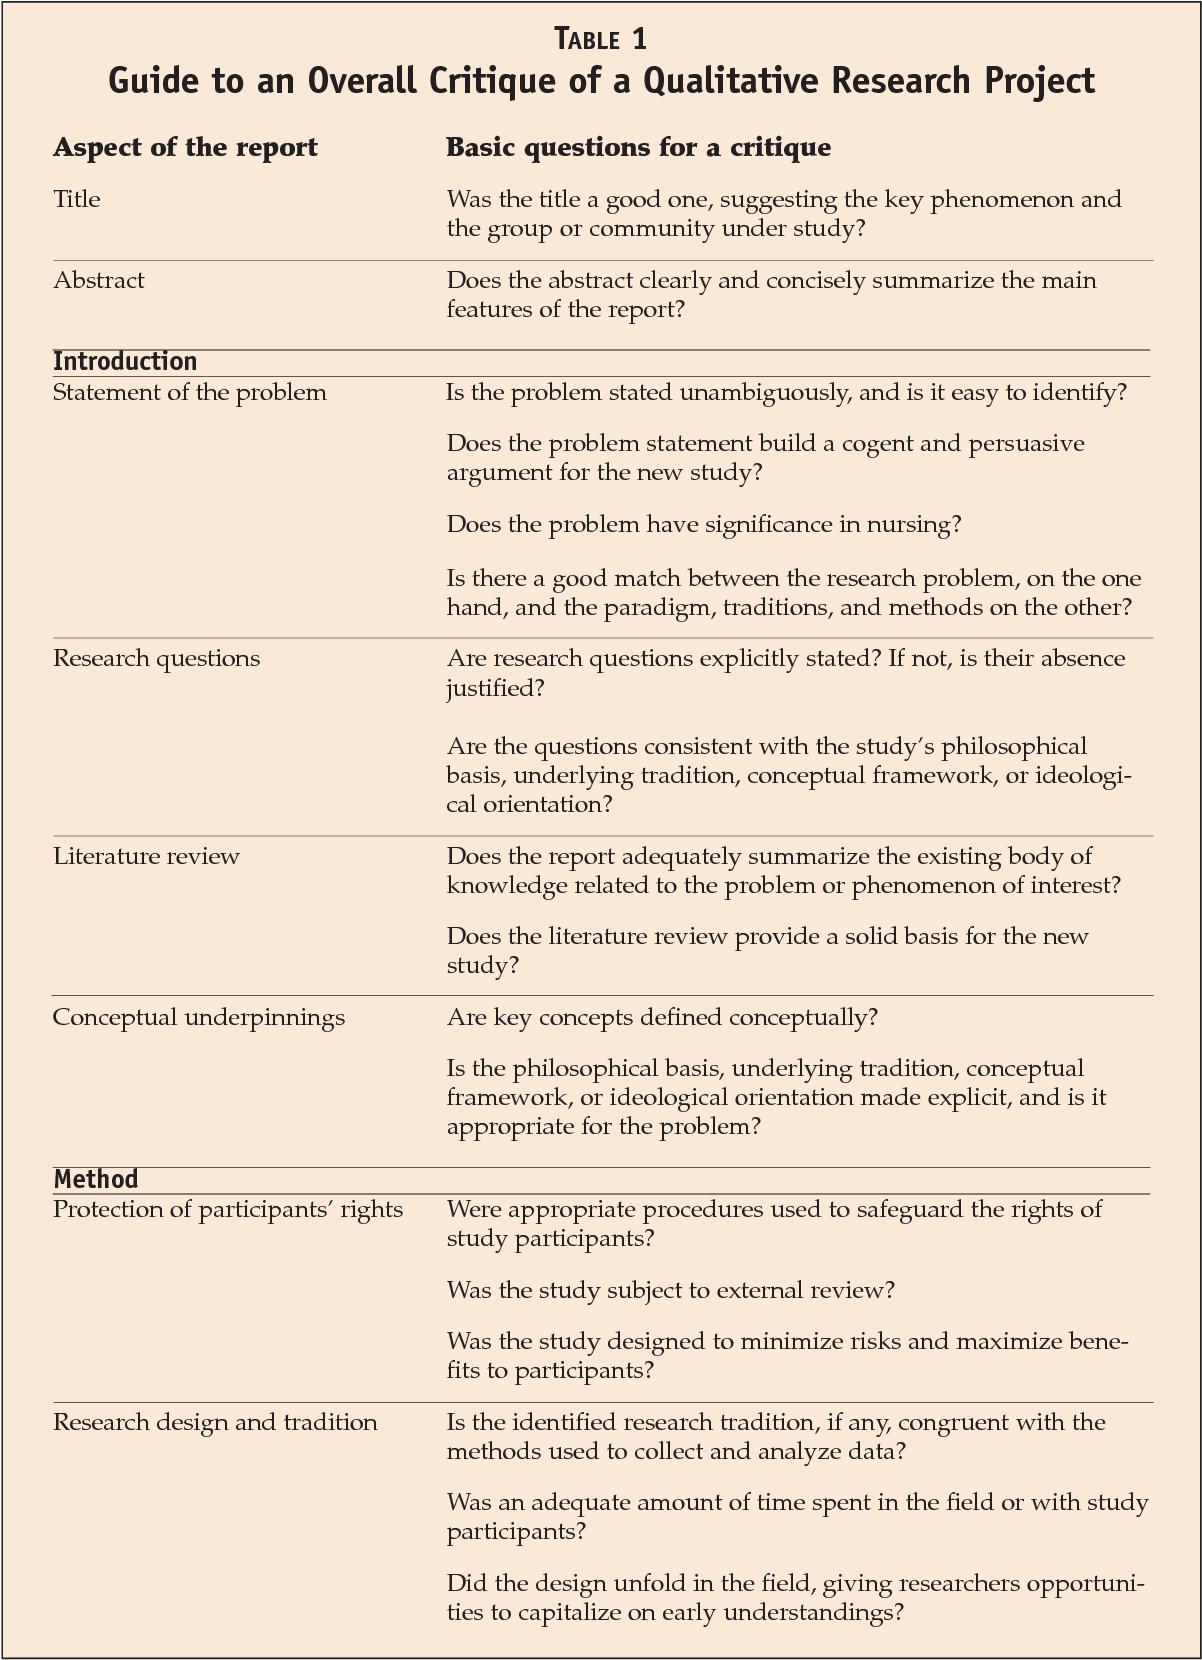 critiquing framework for qualitative research